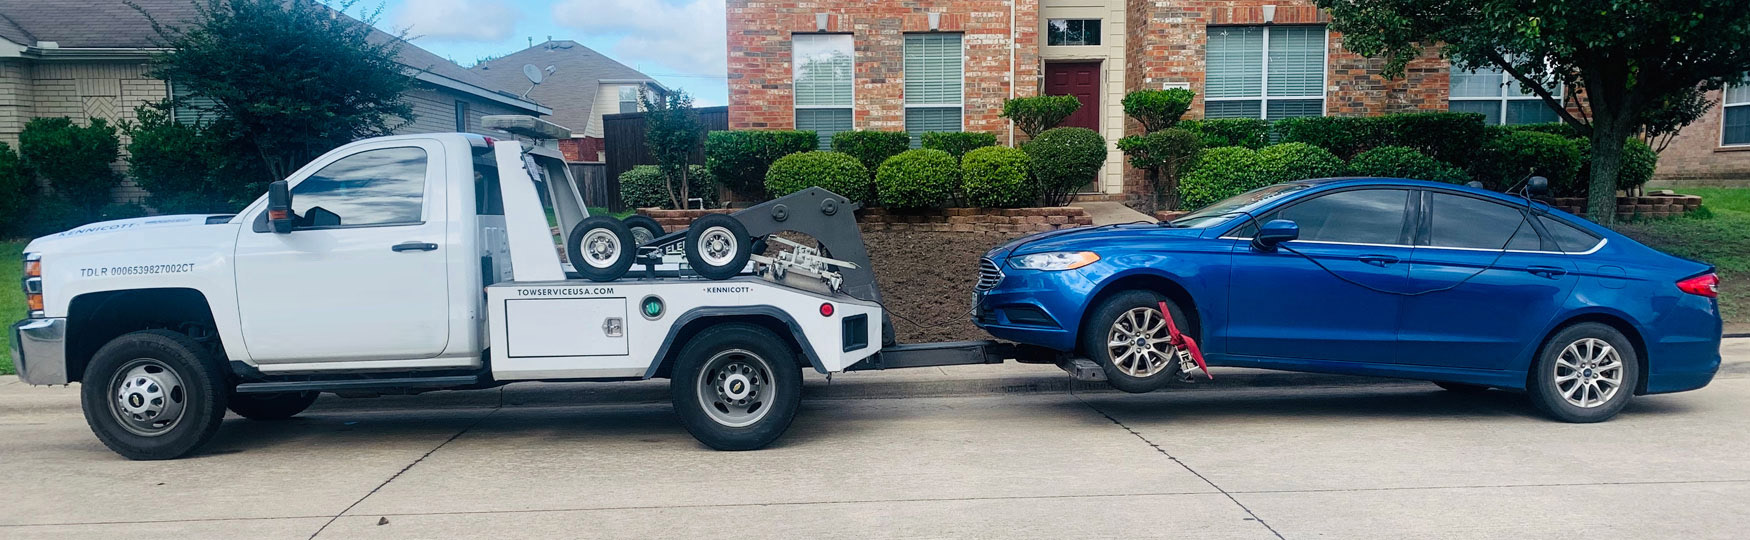 Wheel Lift Tow Truck In NC Hauling Blue Car